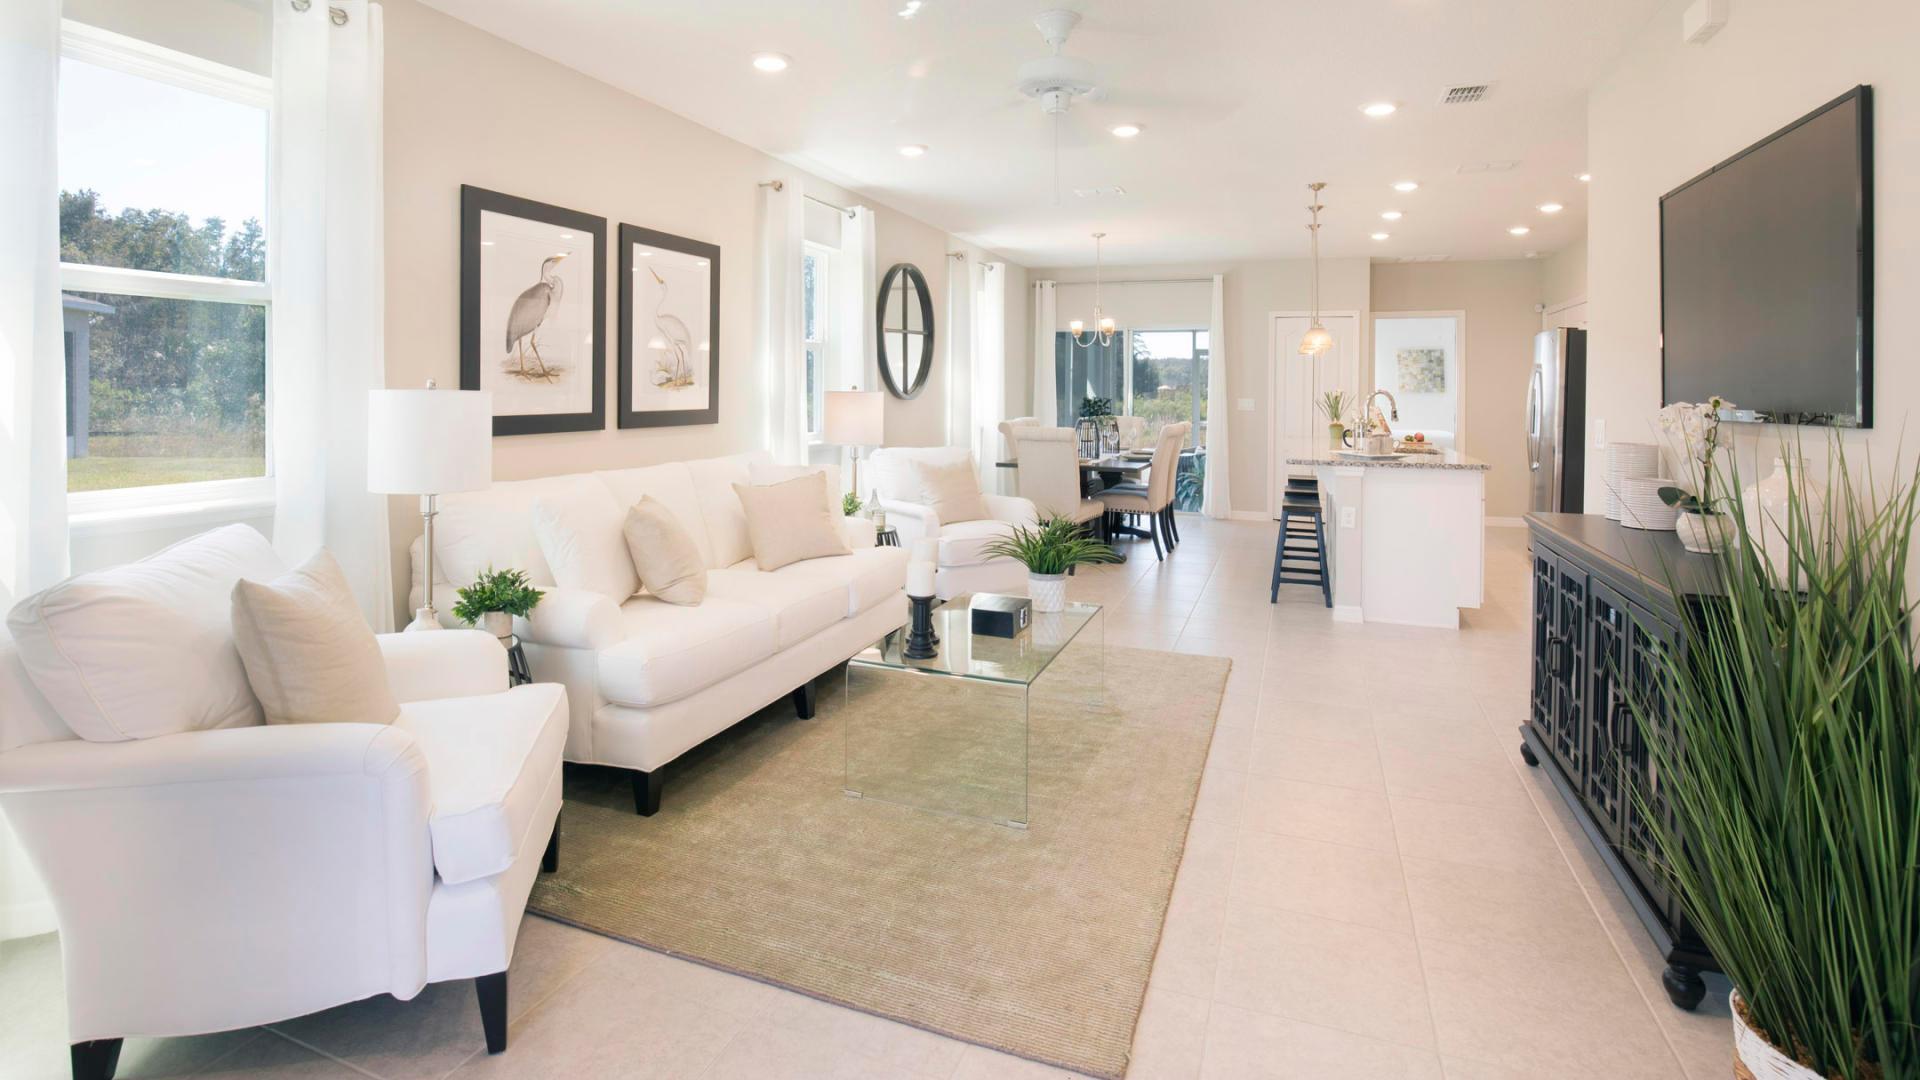 Living Area featured in the Valencia By Maronda Homes in Daytona Beach, FL